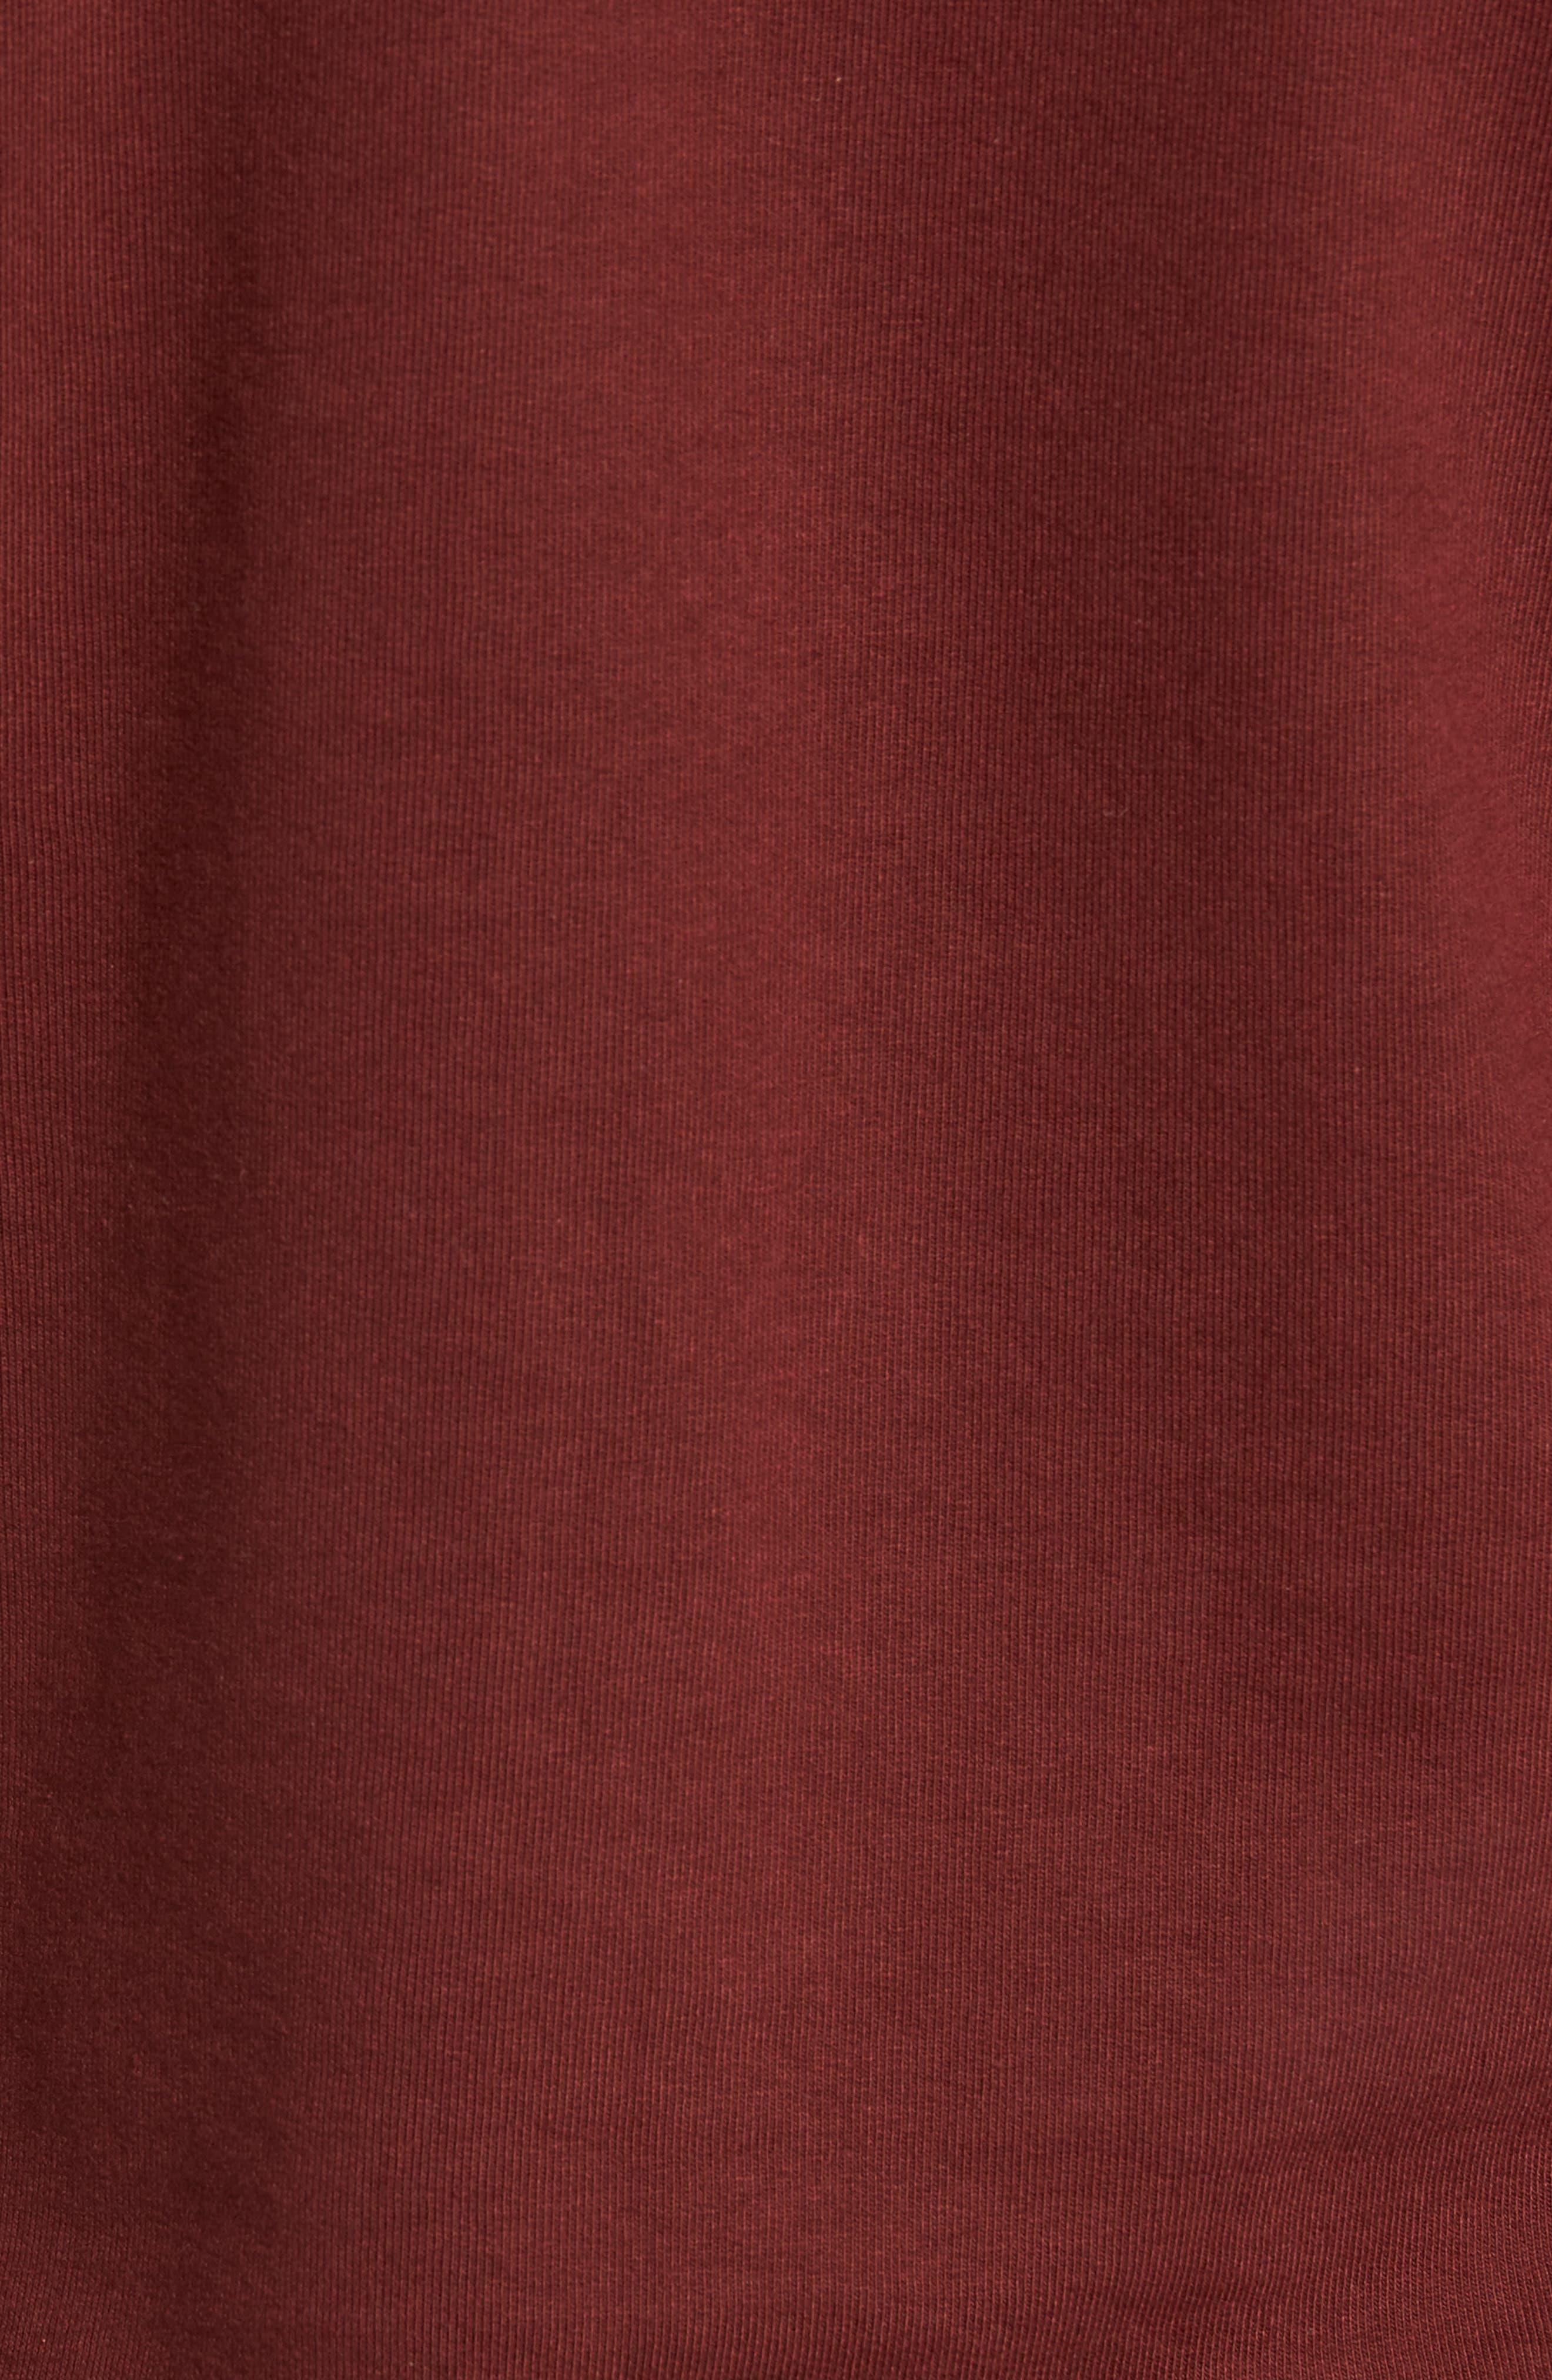 B-Side Reversible Crewneck Sweatshirt,                             Alternate thumbnail 4, color,                             Maroon